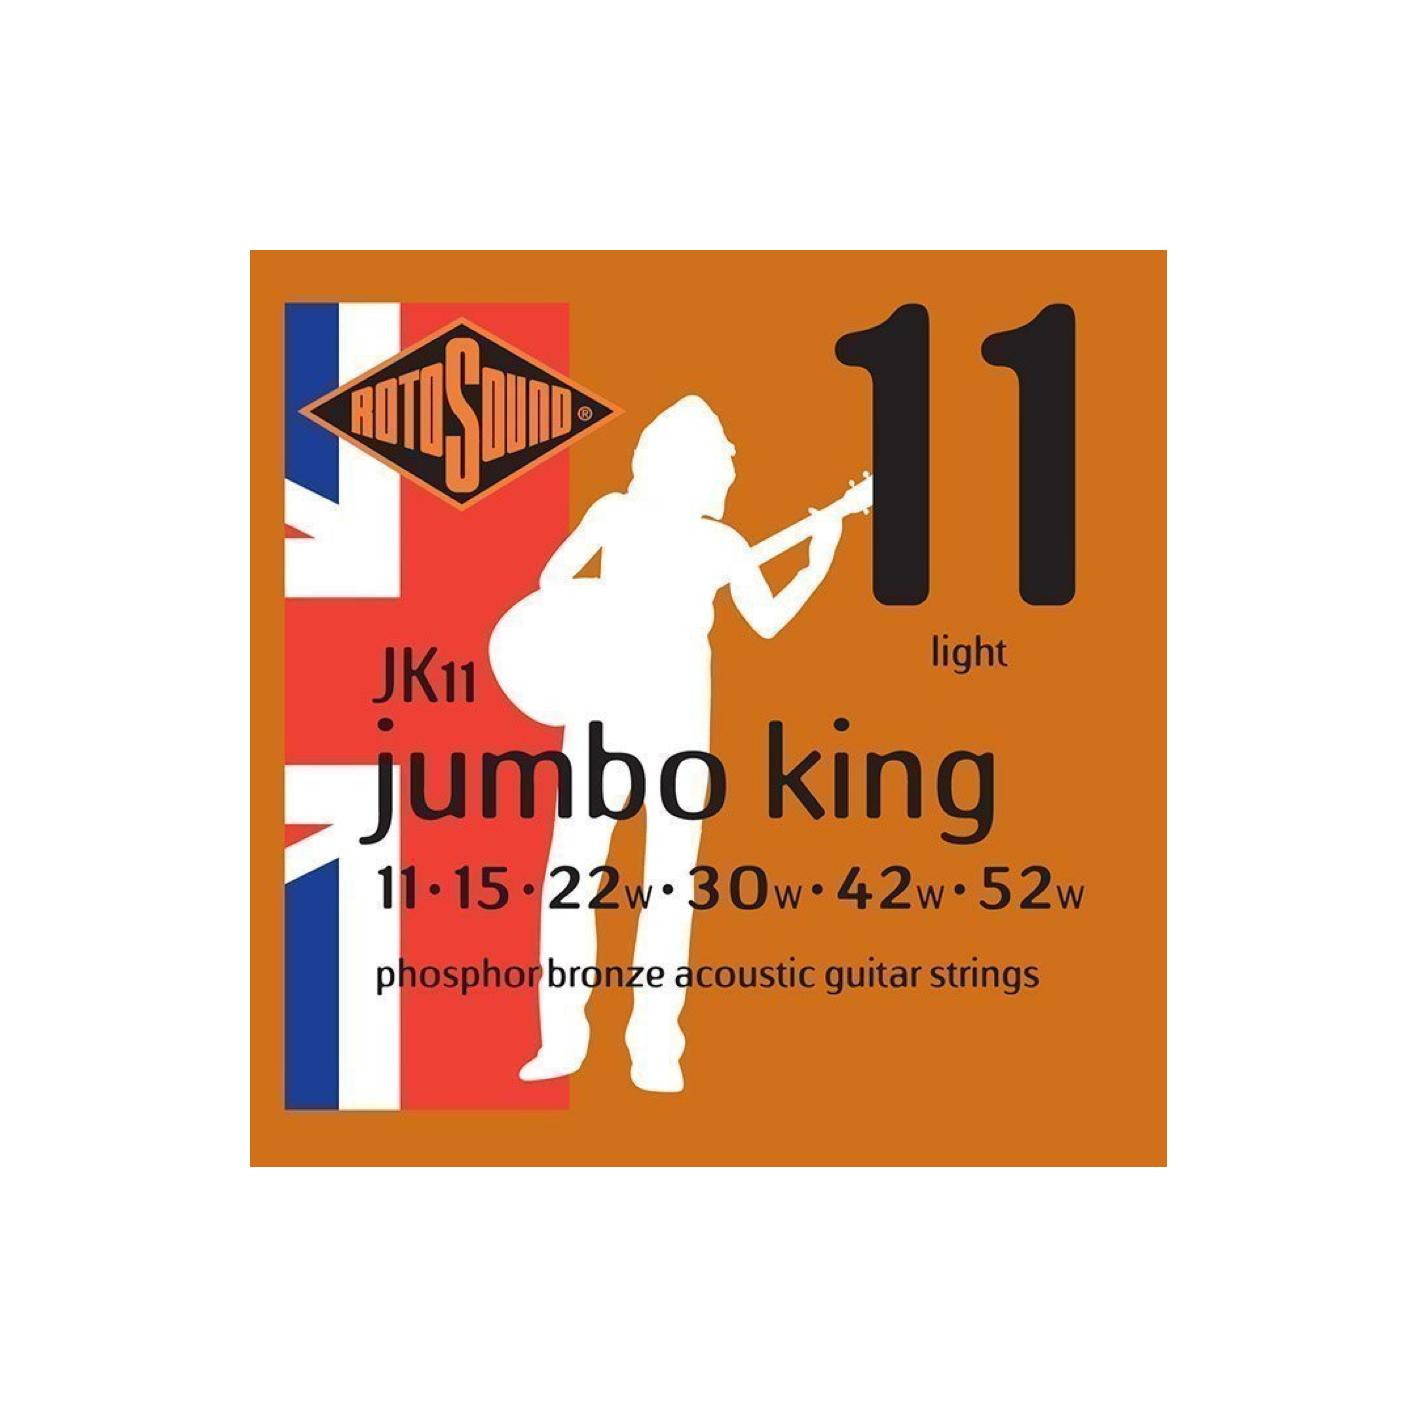 Rotosound Jumbo King Phosphor Bronze Acoustic Strings